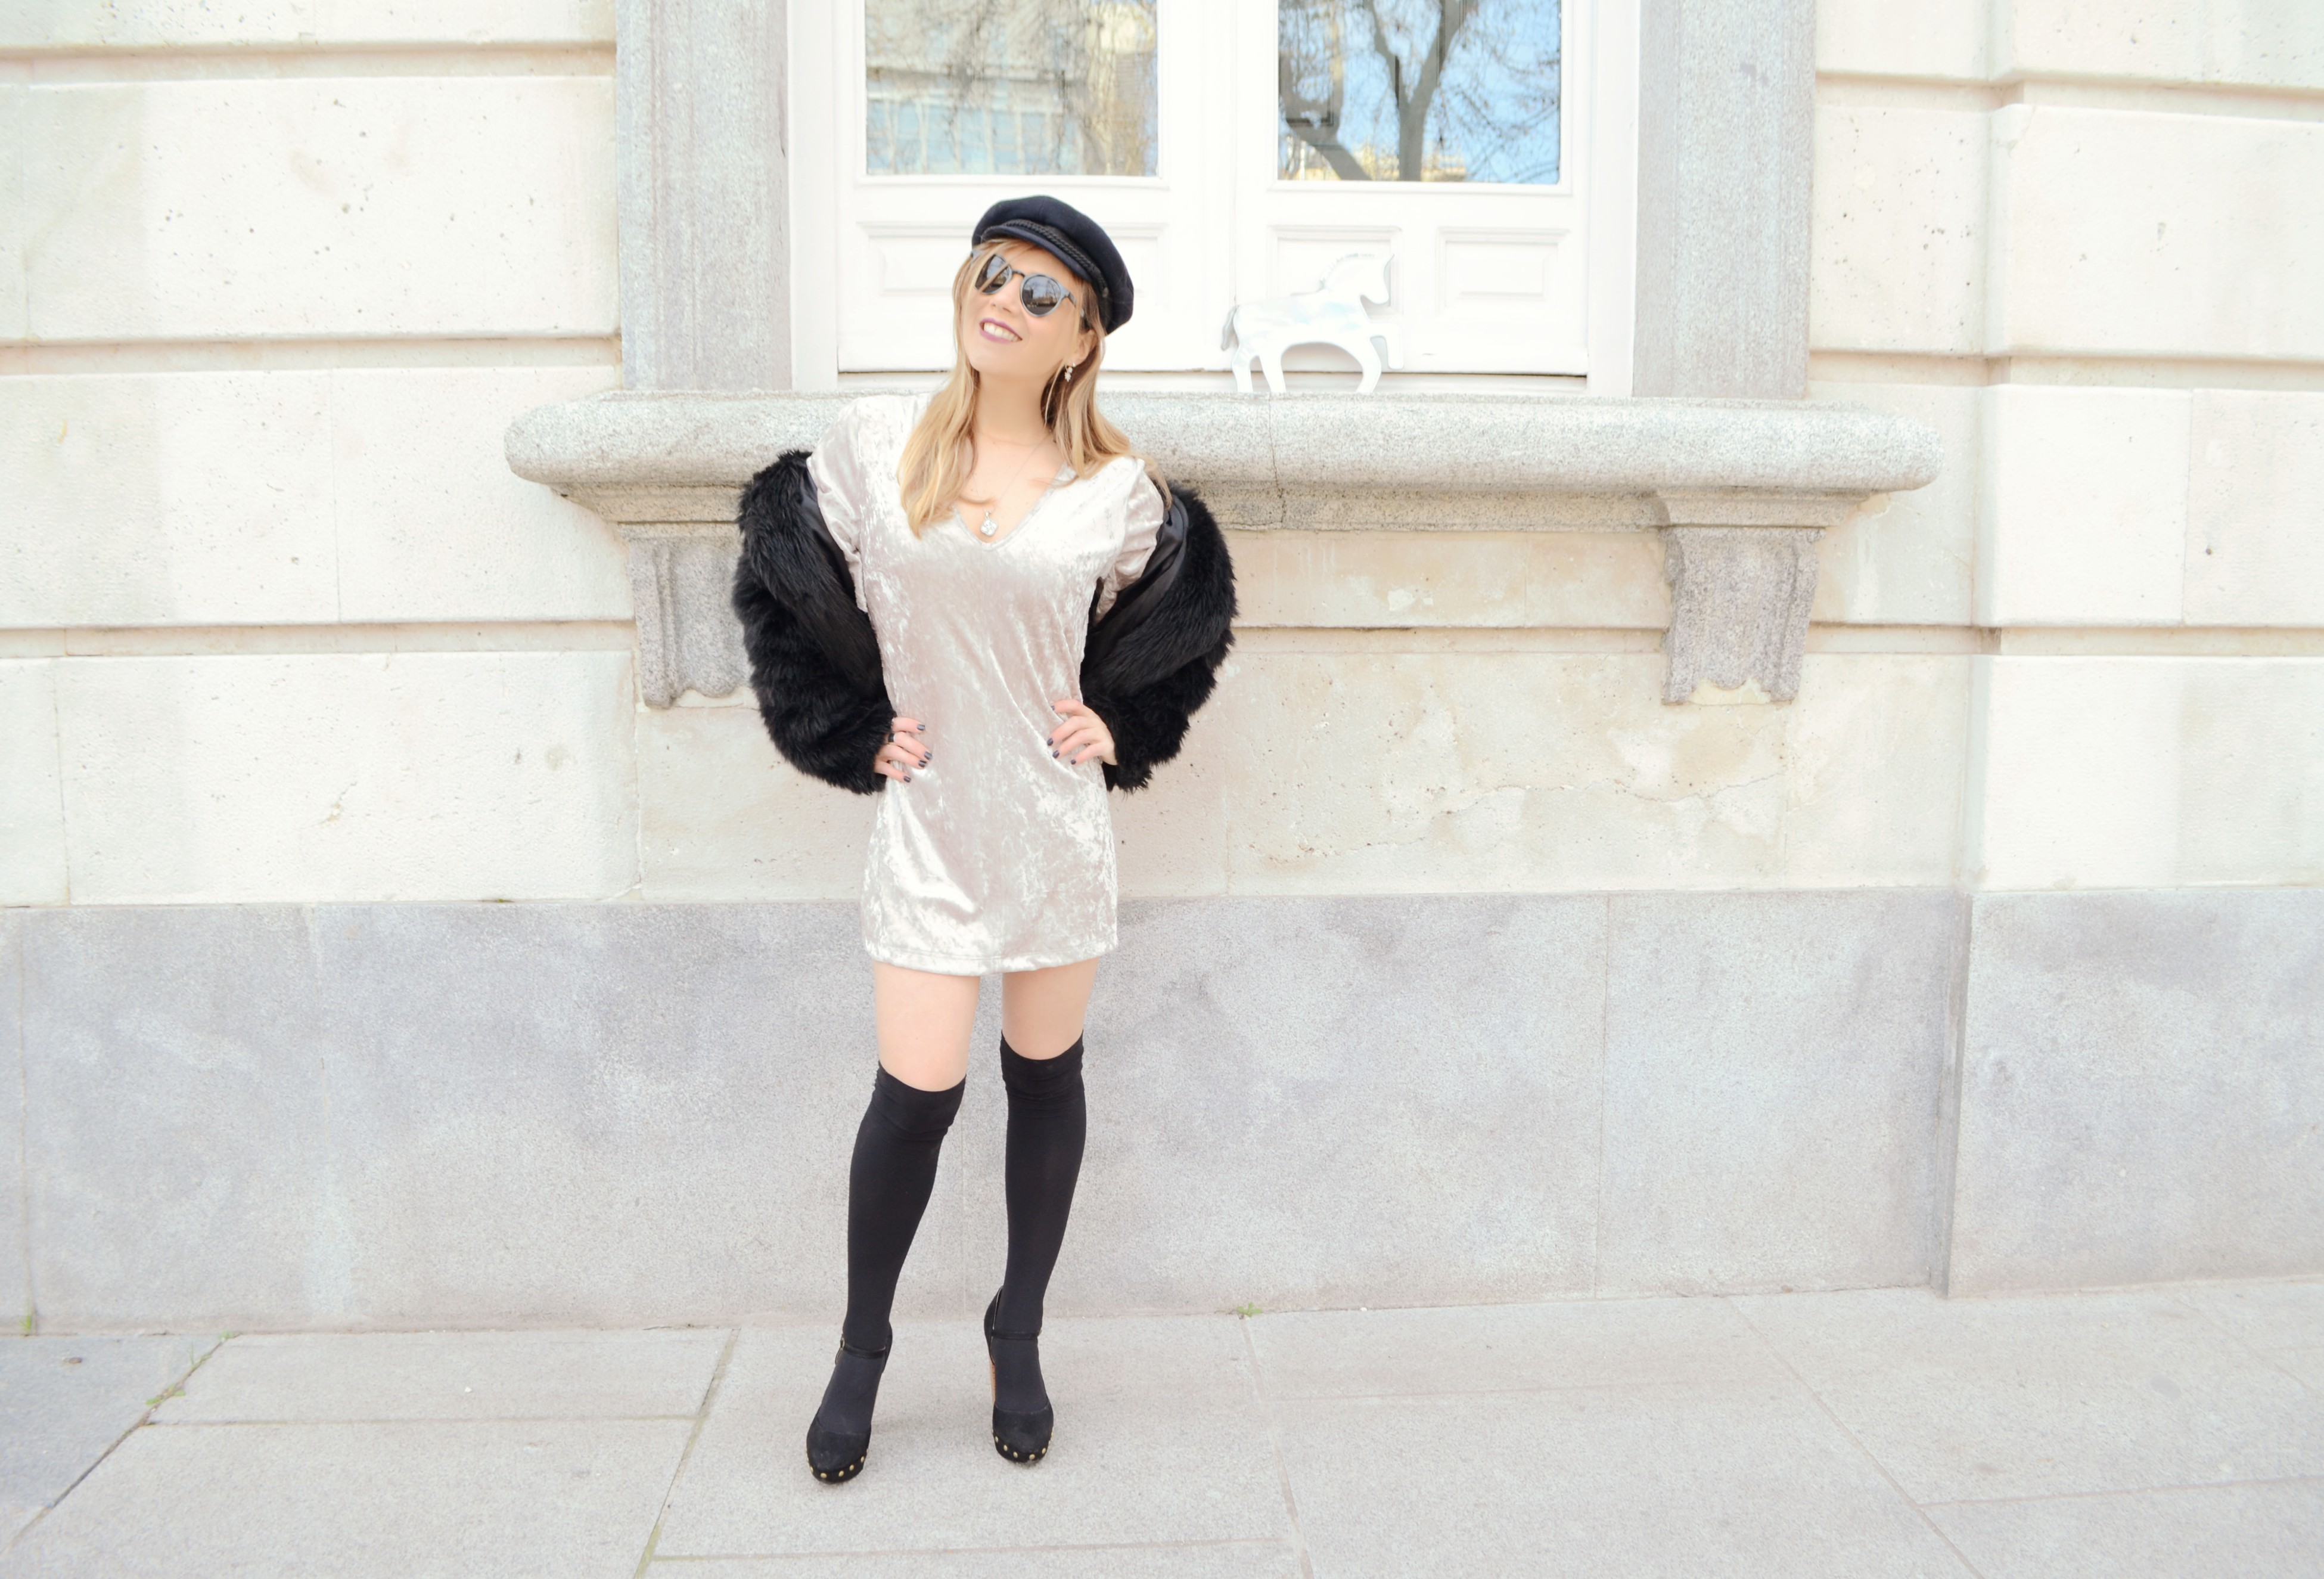 Vestido velvet piensa en chic - Madrid chic style ...